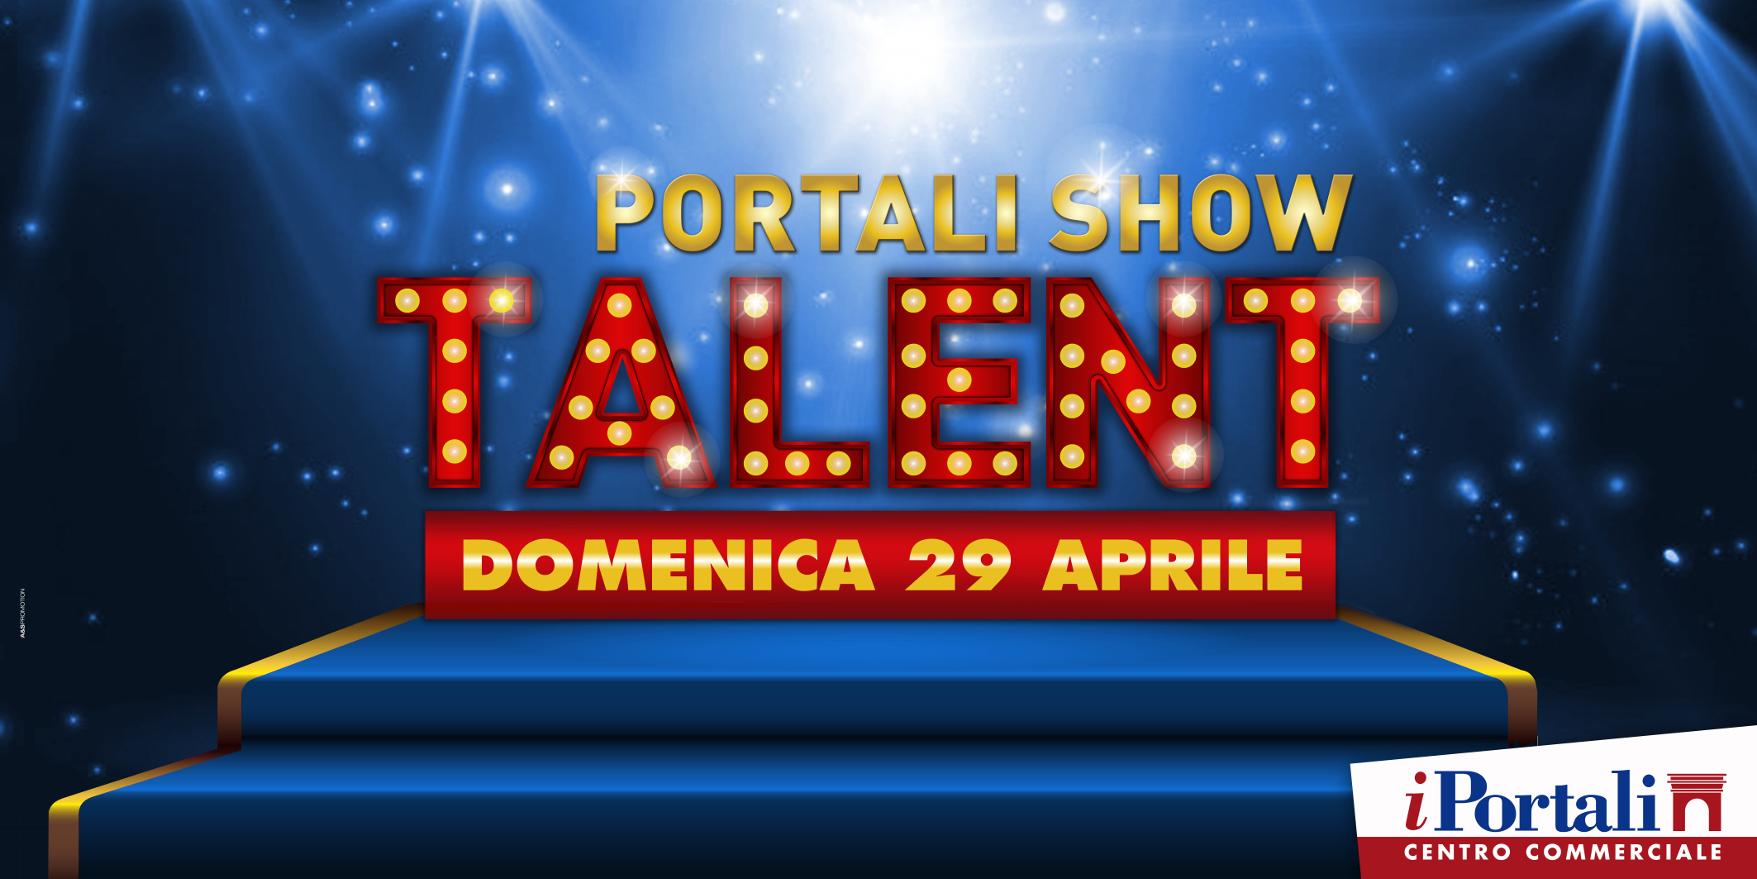 i-portali_show-talent_manifesto-6x3-1